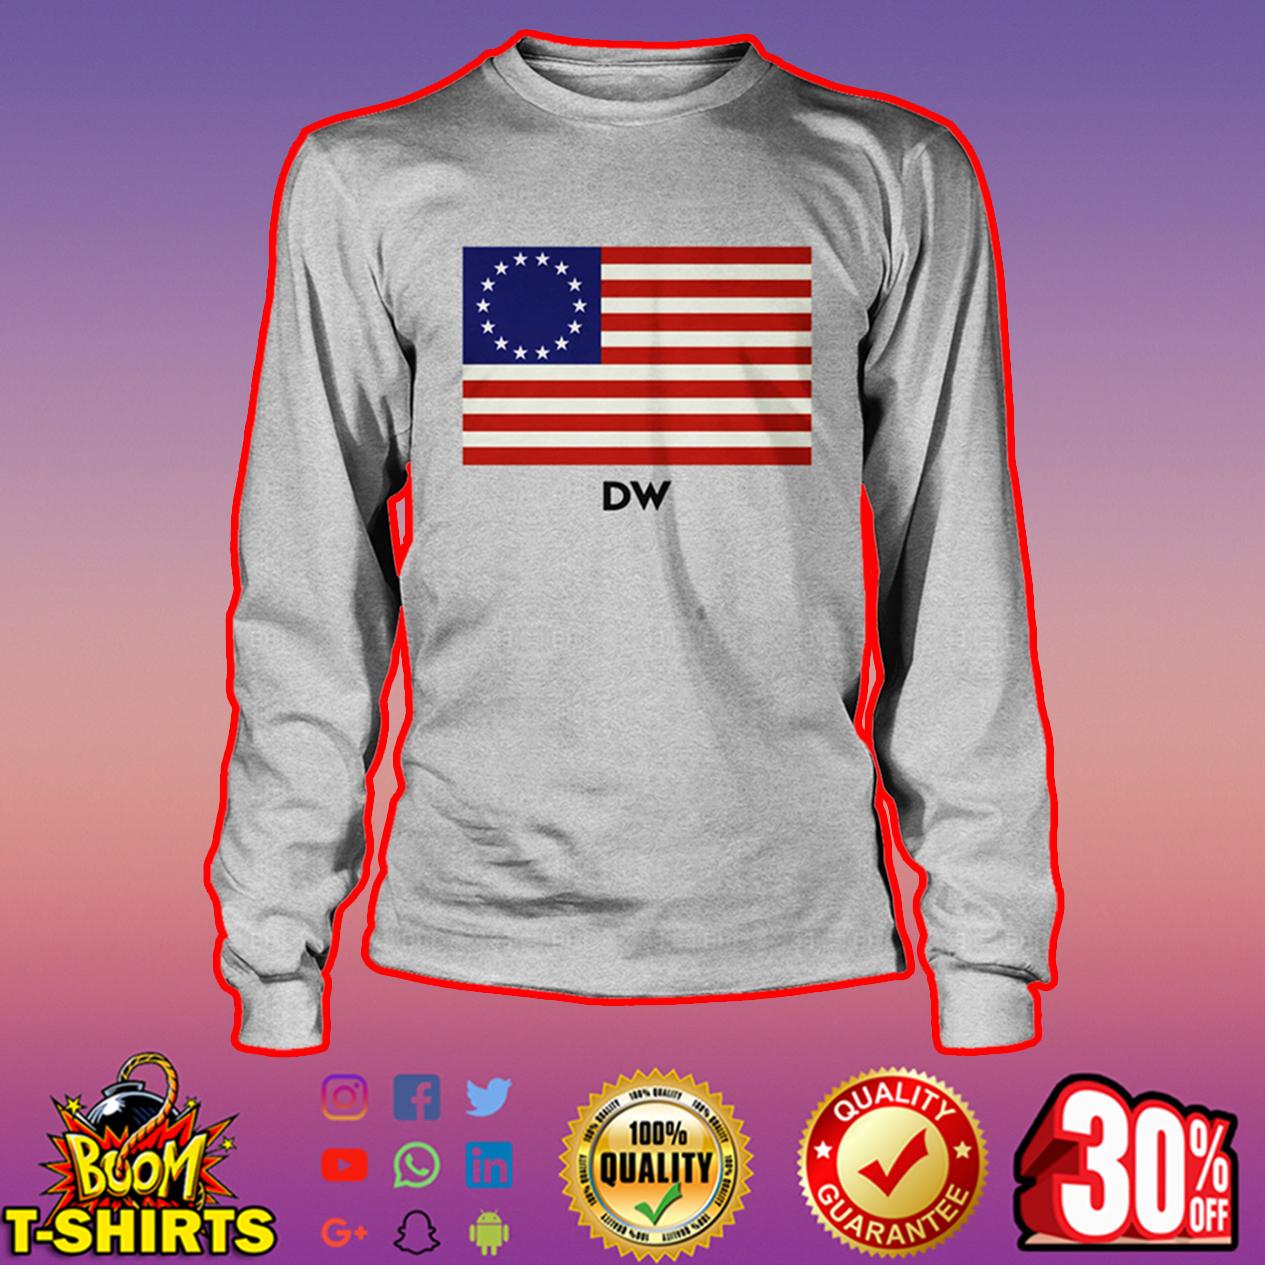 DW Betsy Ross flag long sleeve tee